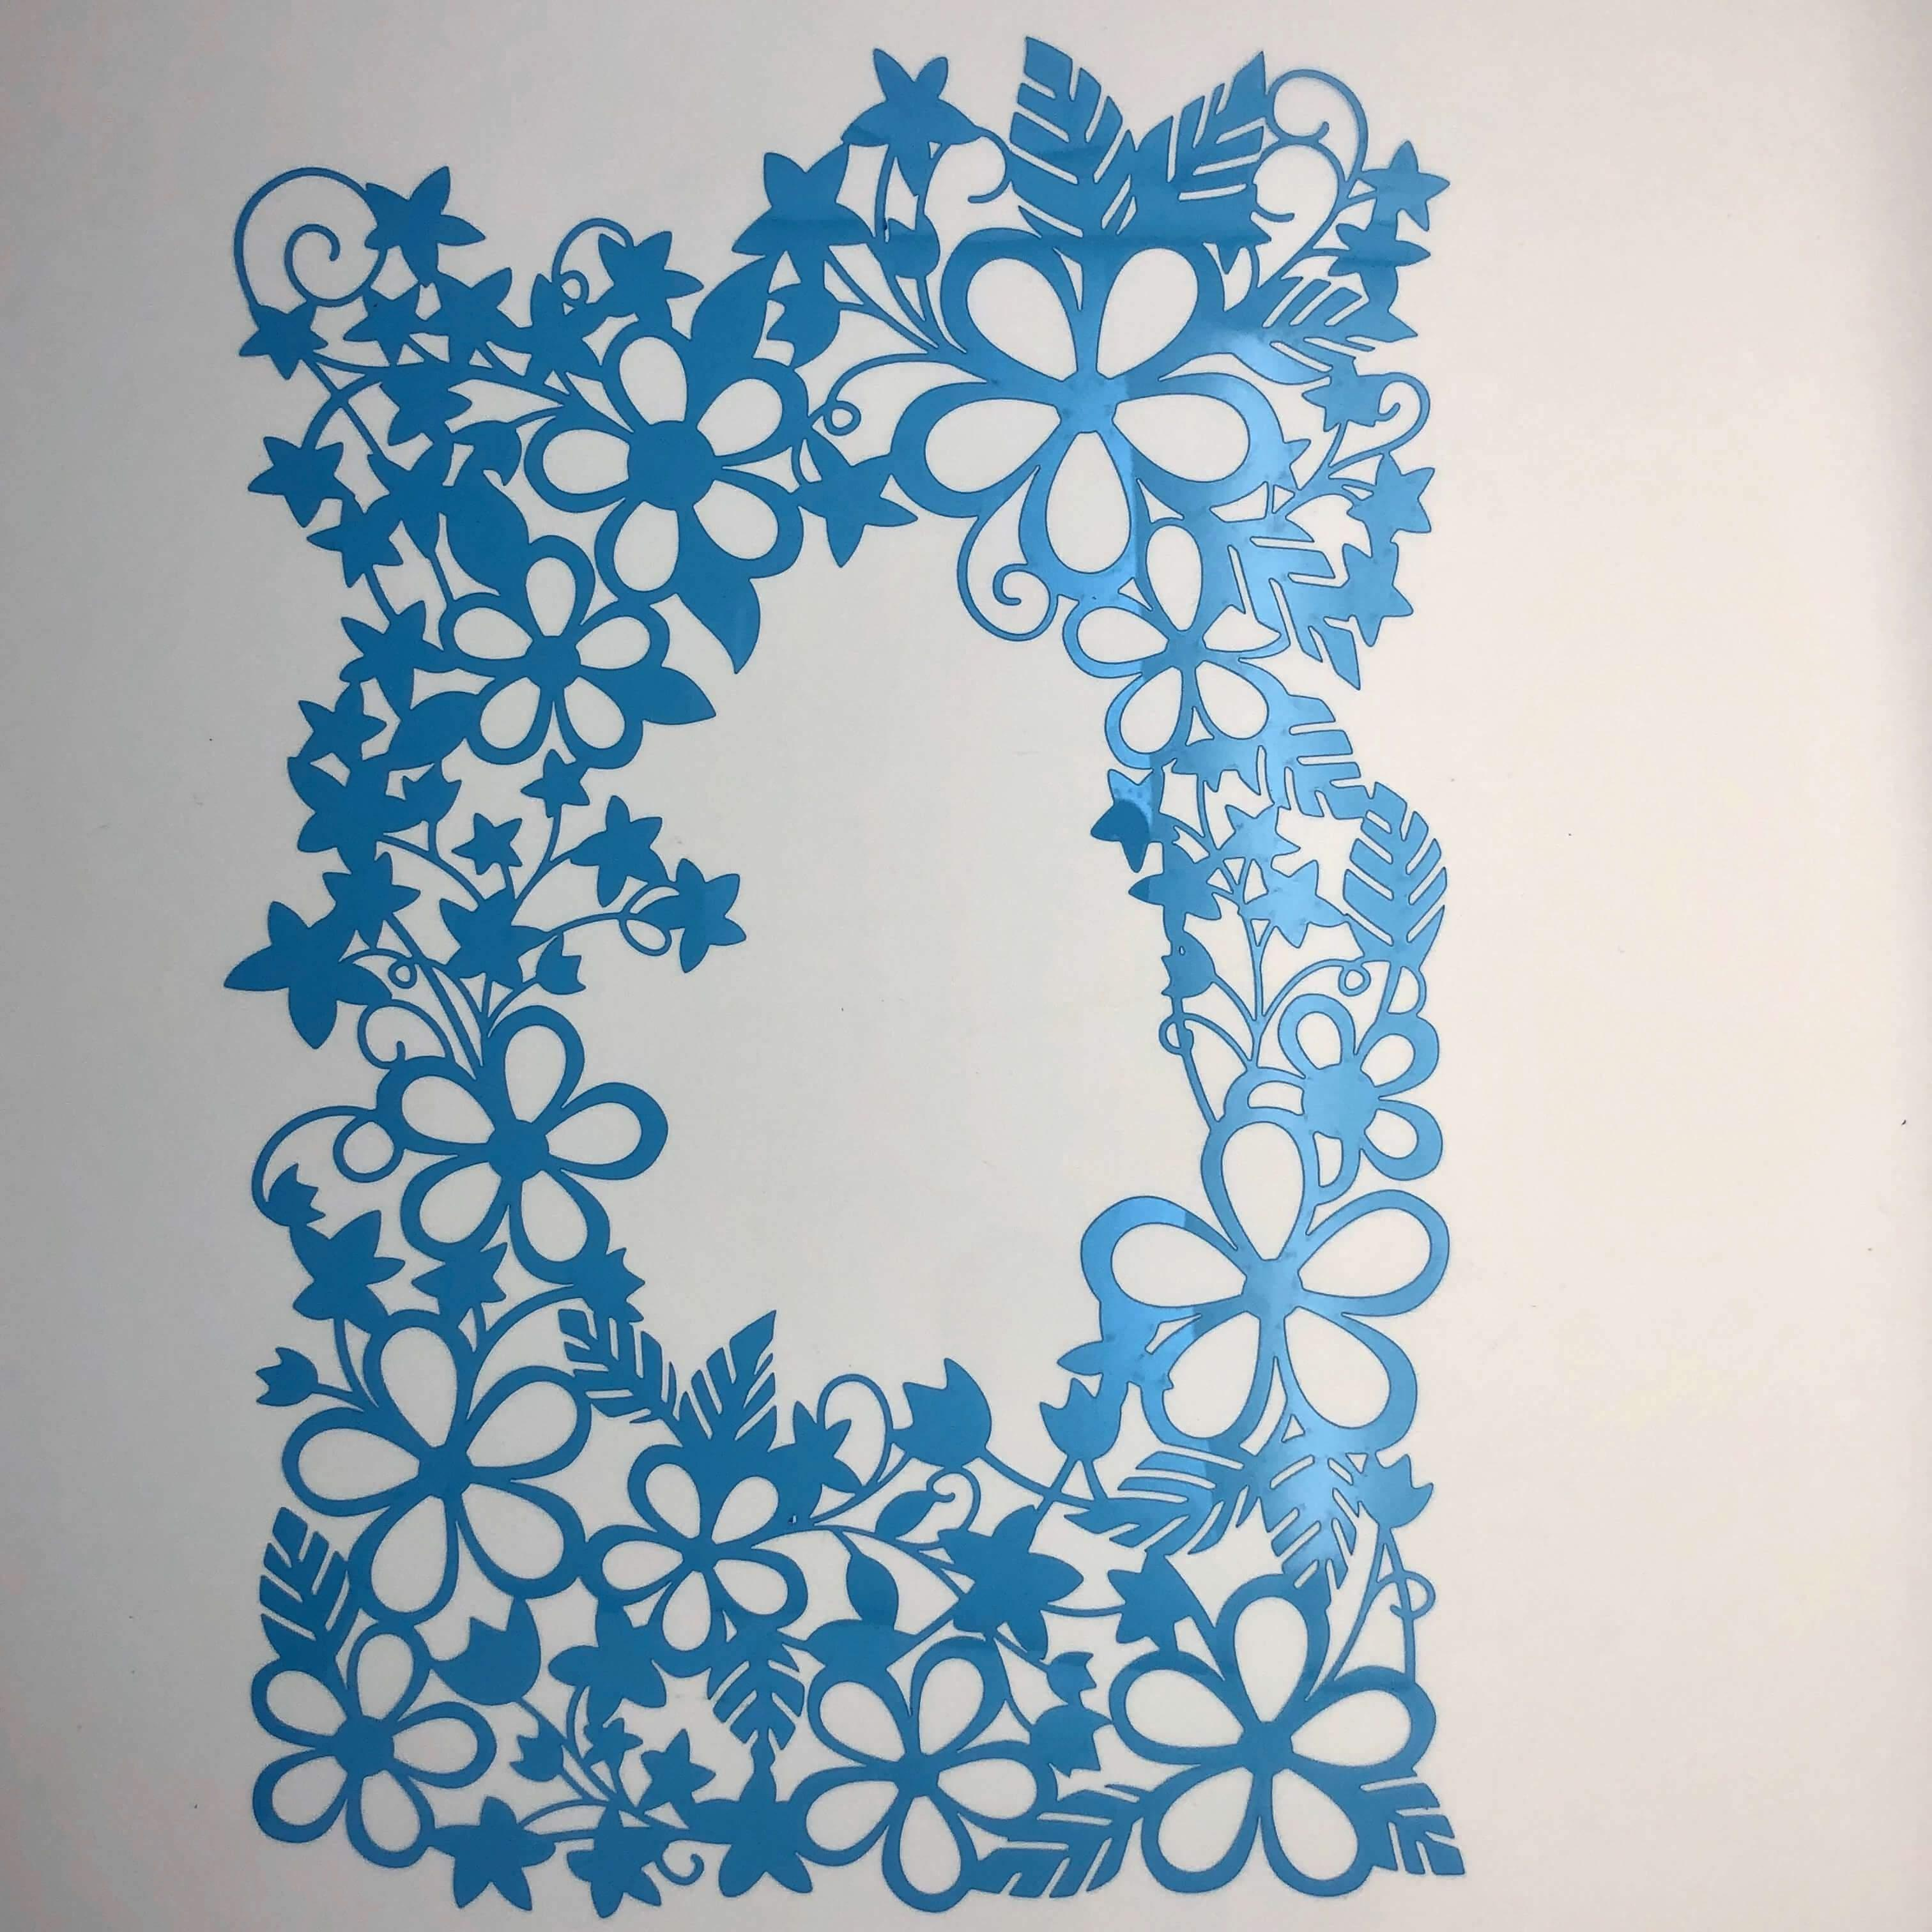 Arabesque Flowers 6.69 x 13 in : Template Diy Reusable Laser Cut Stencils